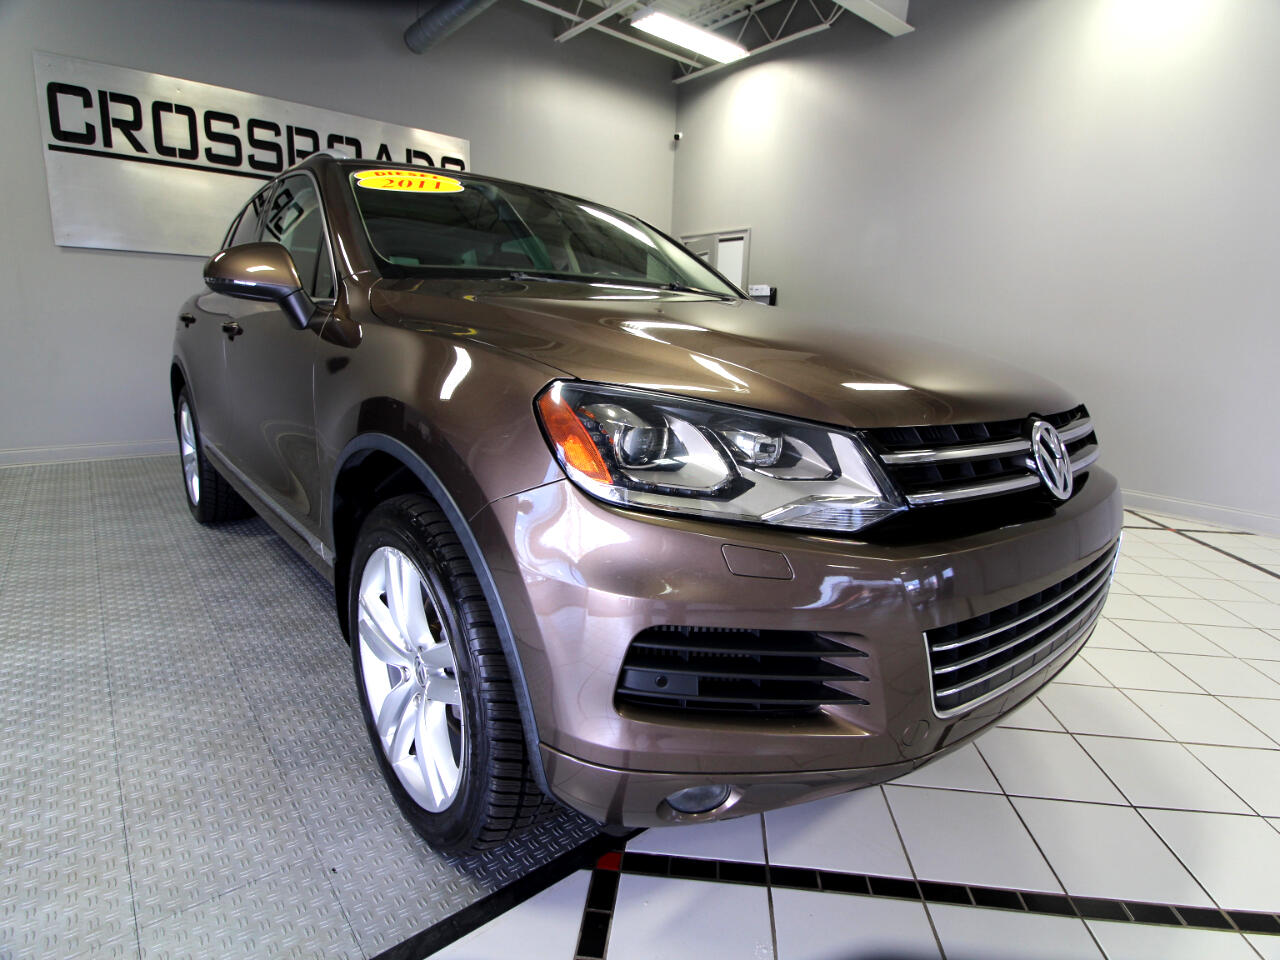 Volkswagen Touareg 4dr TDI Executive 2011